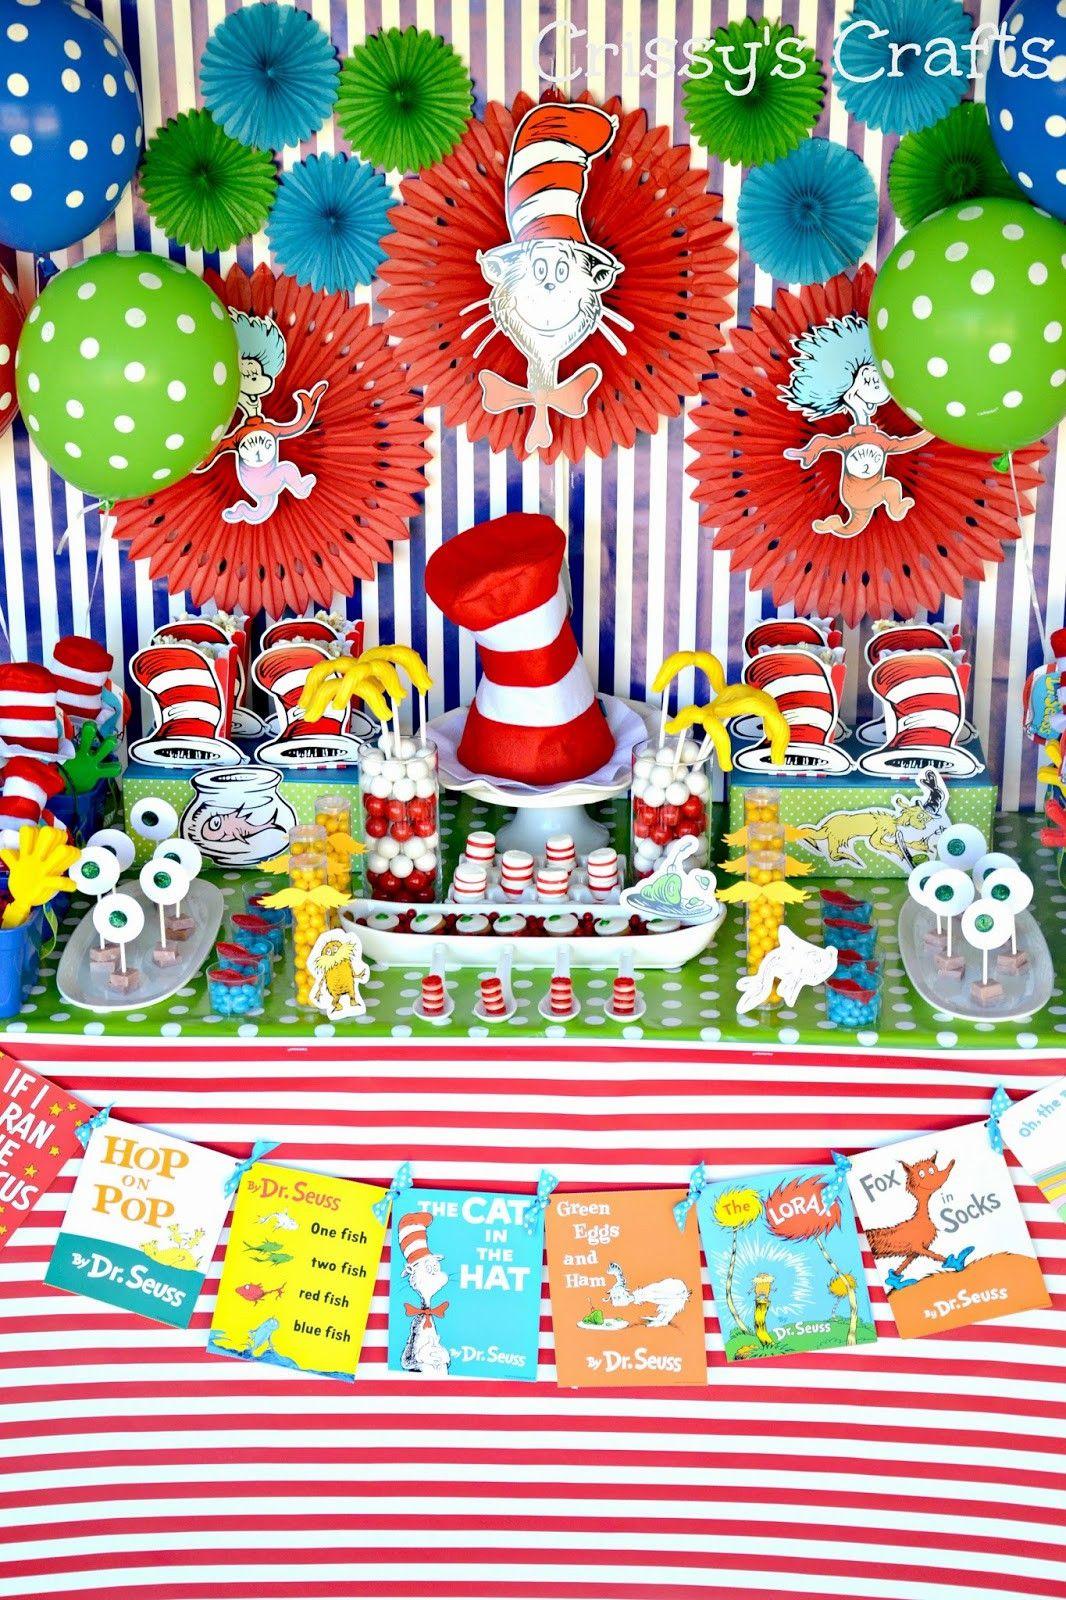 Dr Seuss Party 20 Best Ideas Dr Seuss Birthday Party Supplies Dr Seuss Birthday Party Dr Seuss Party Ideas Dr Suess Birthday Party Ideas